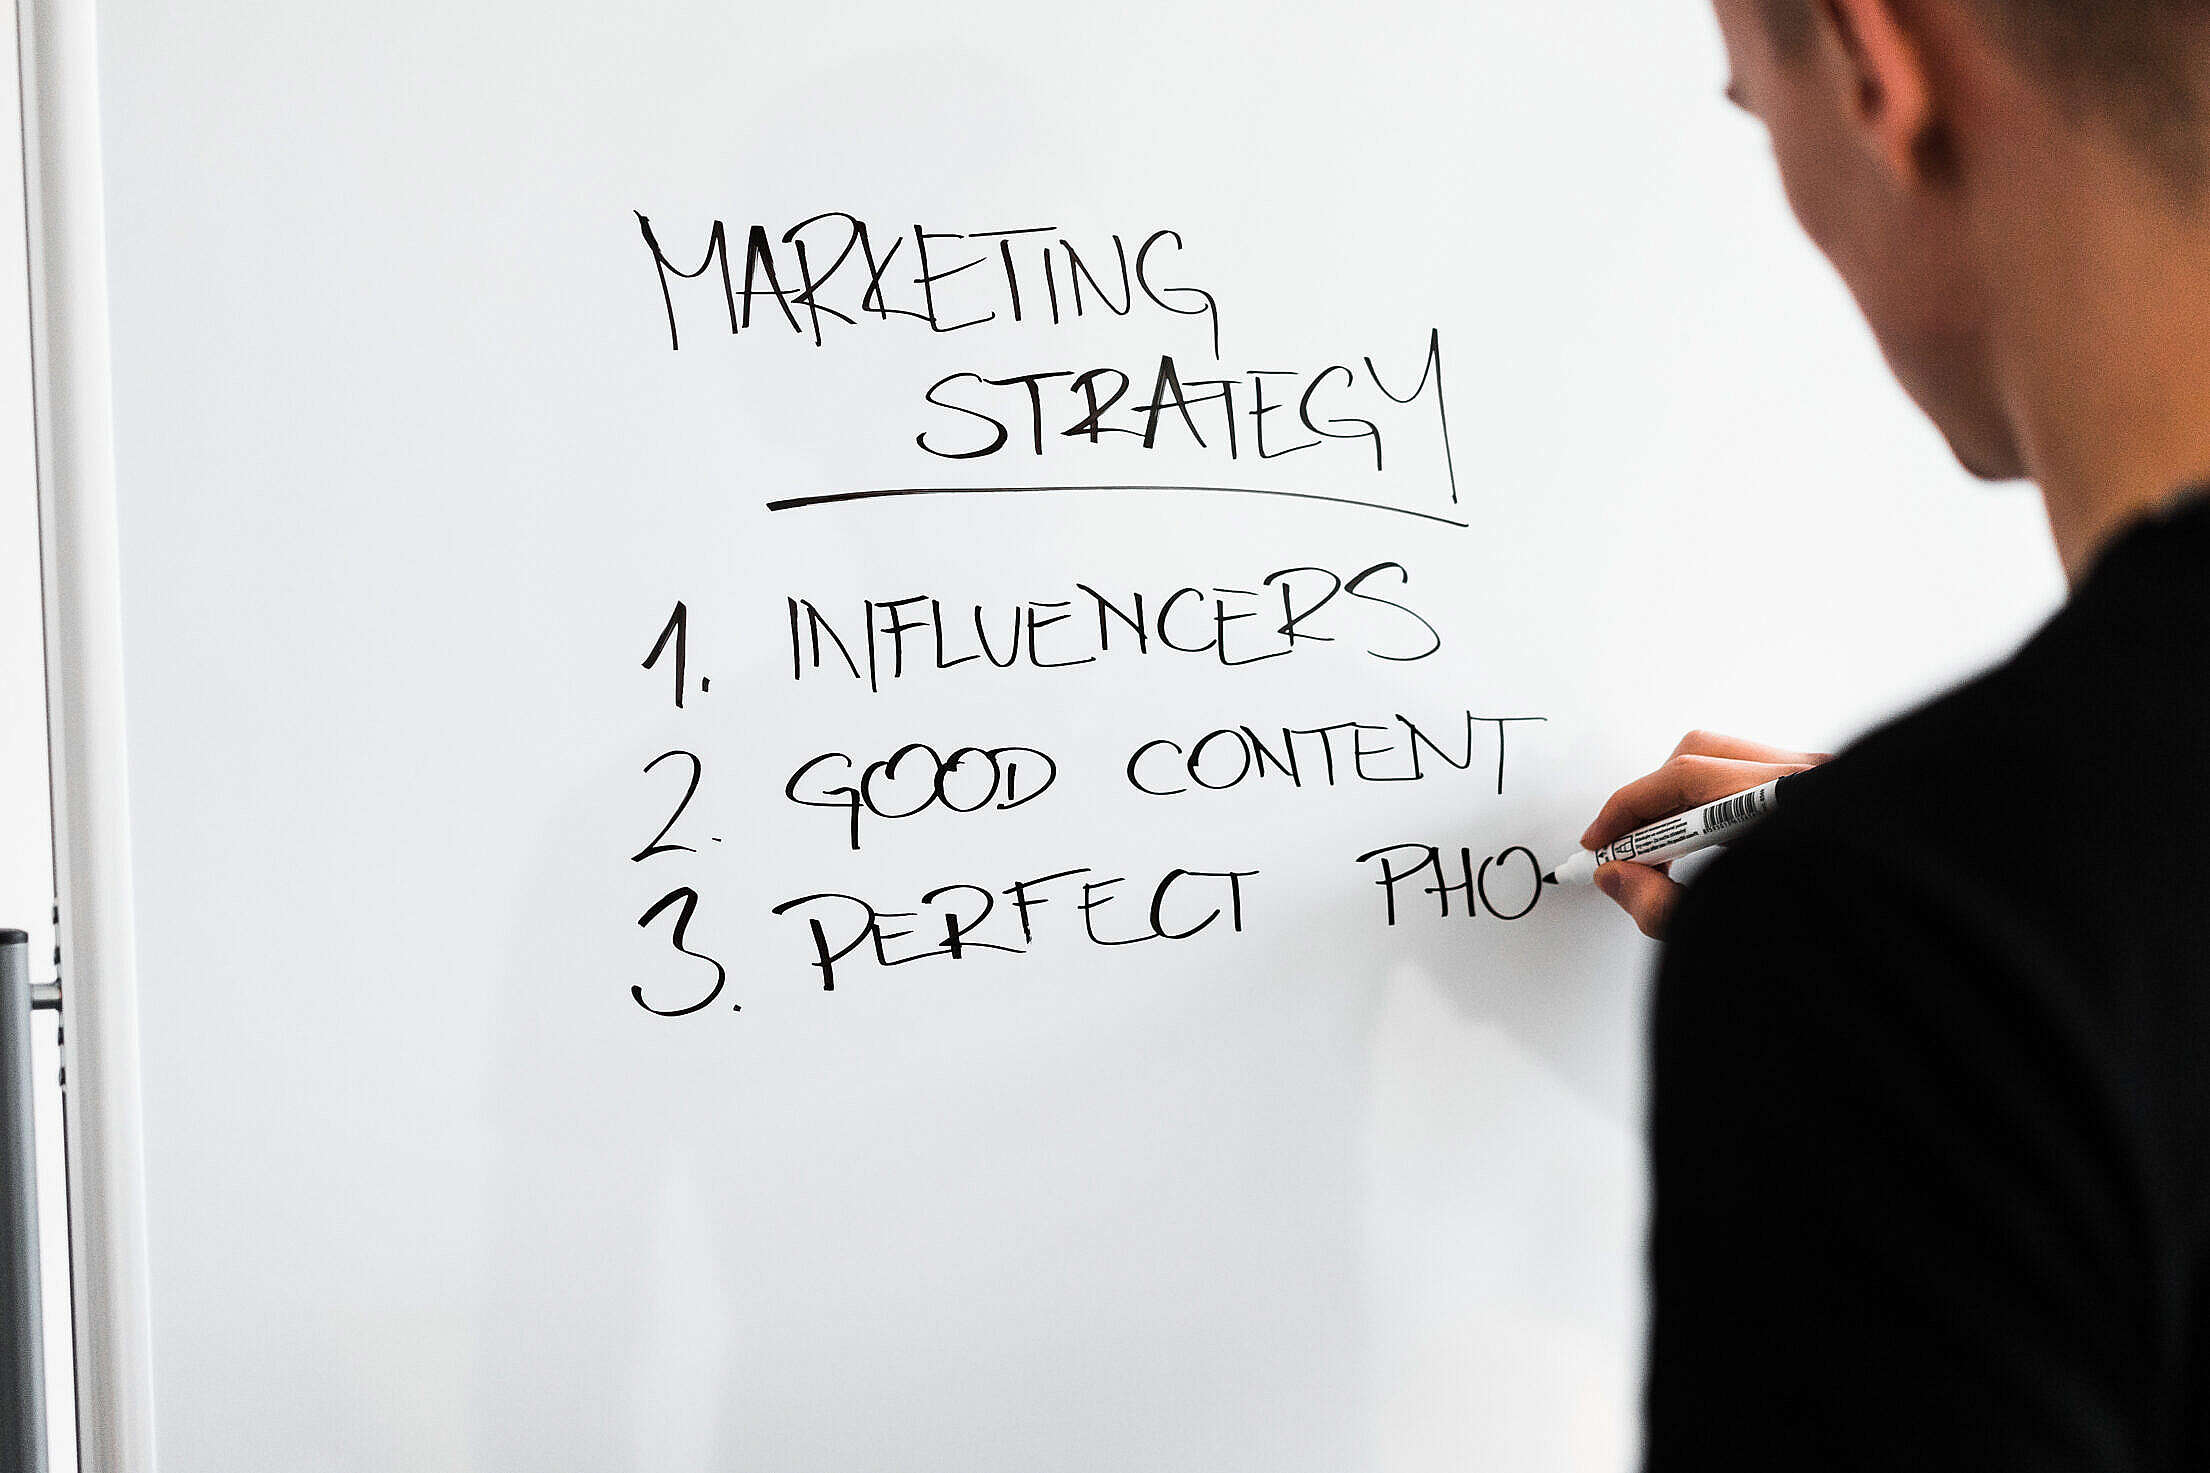 Marketing Expert Writing New Marketing Strategy on Whiteboard Free Stock Photo